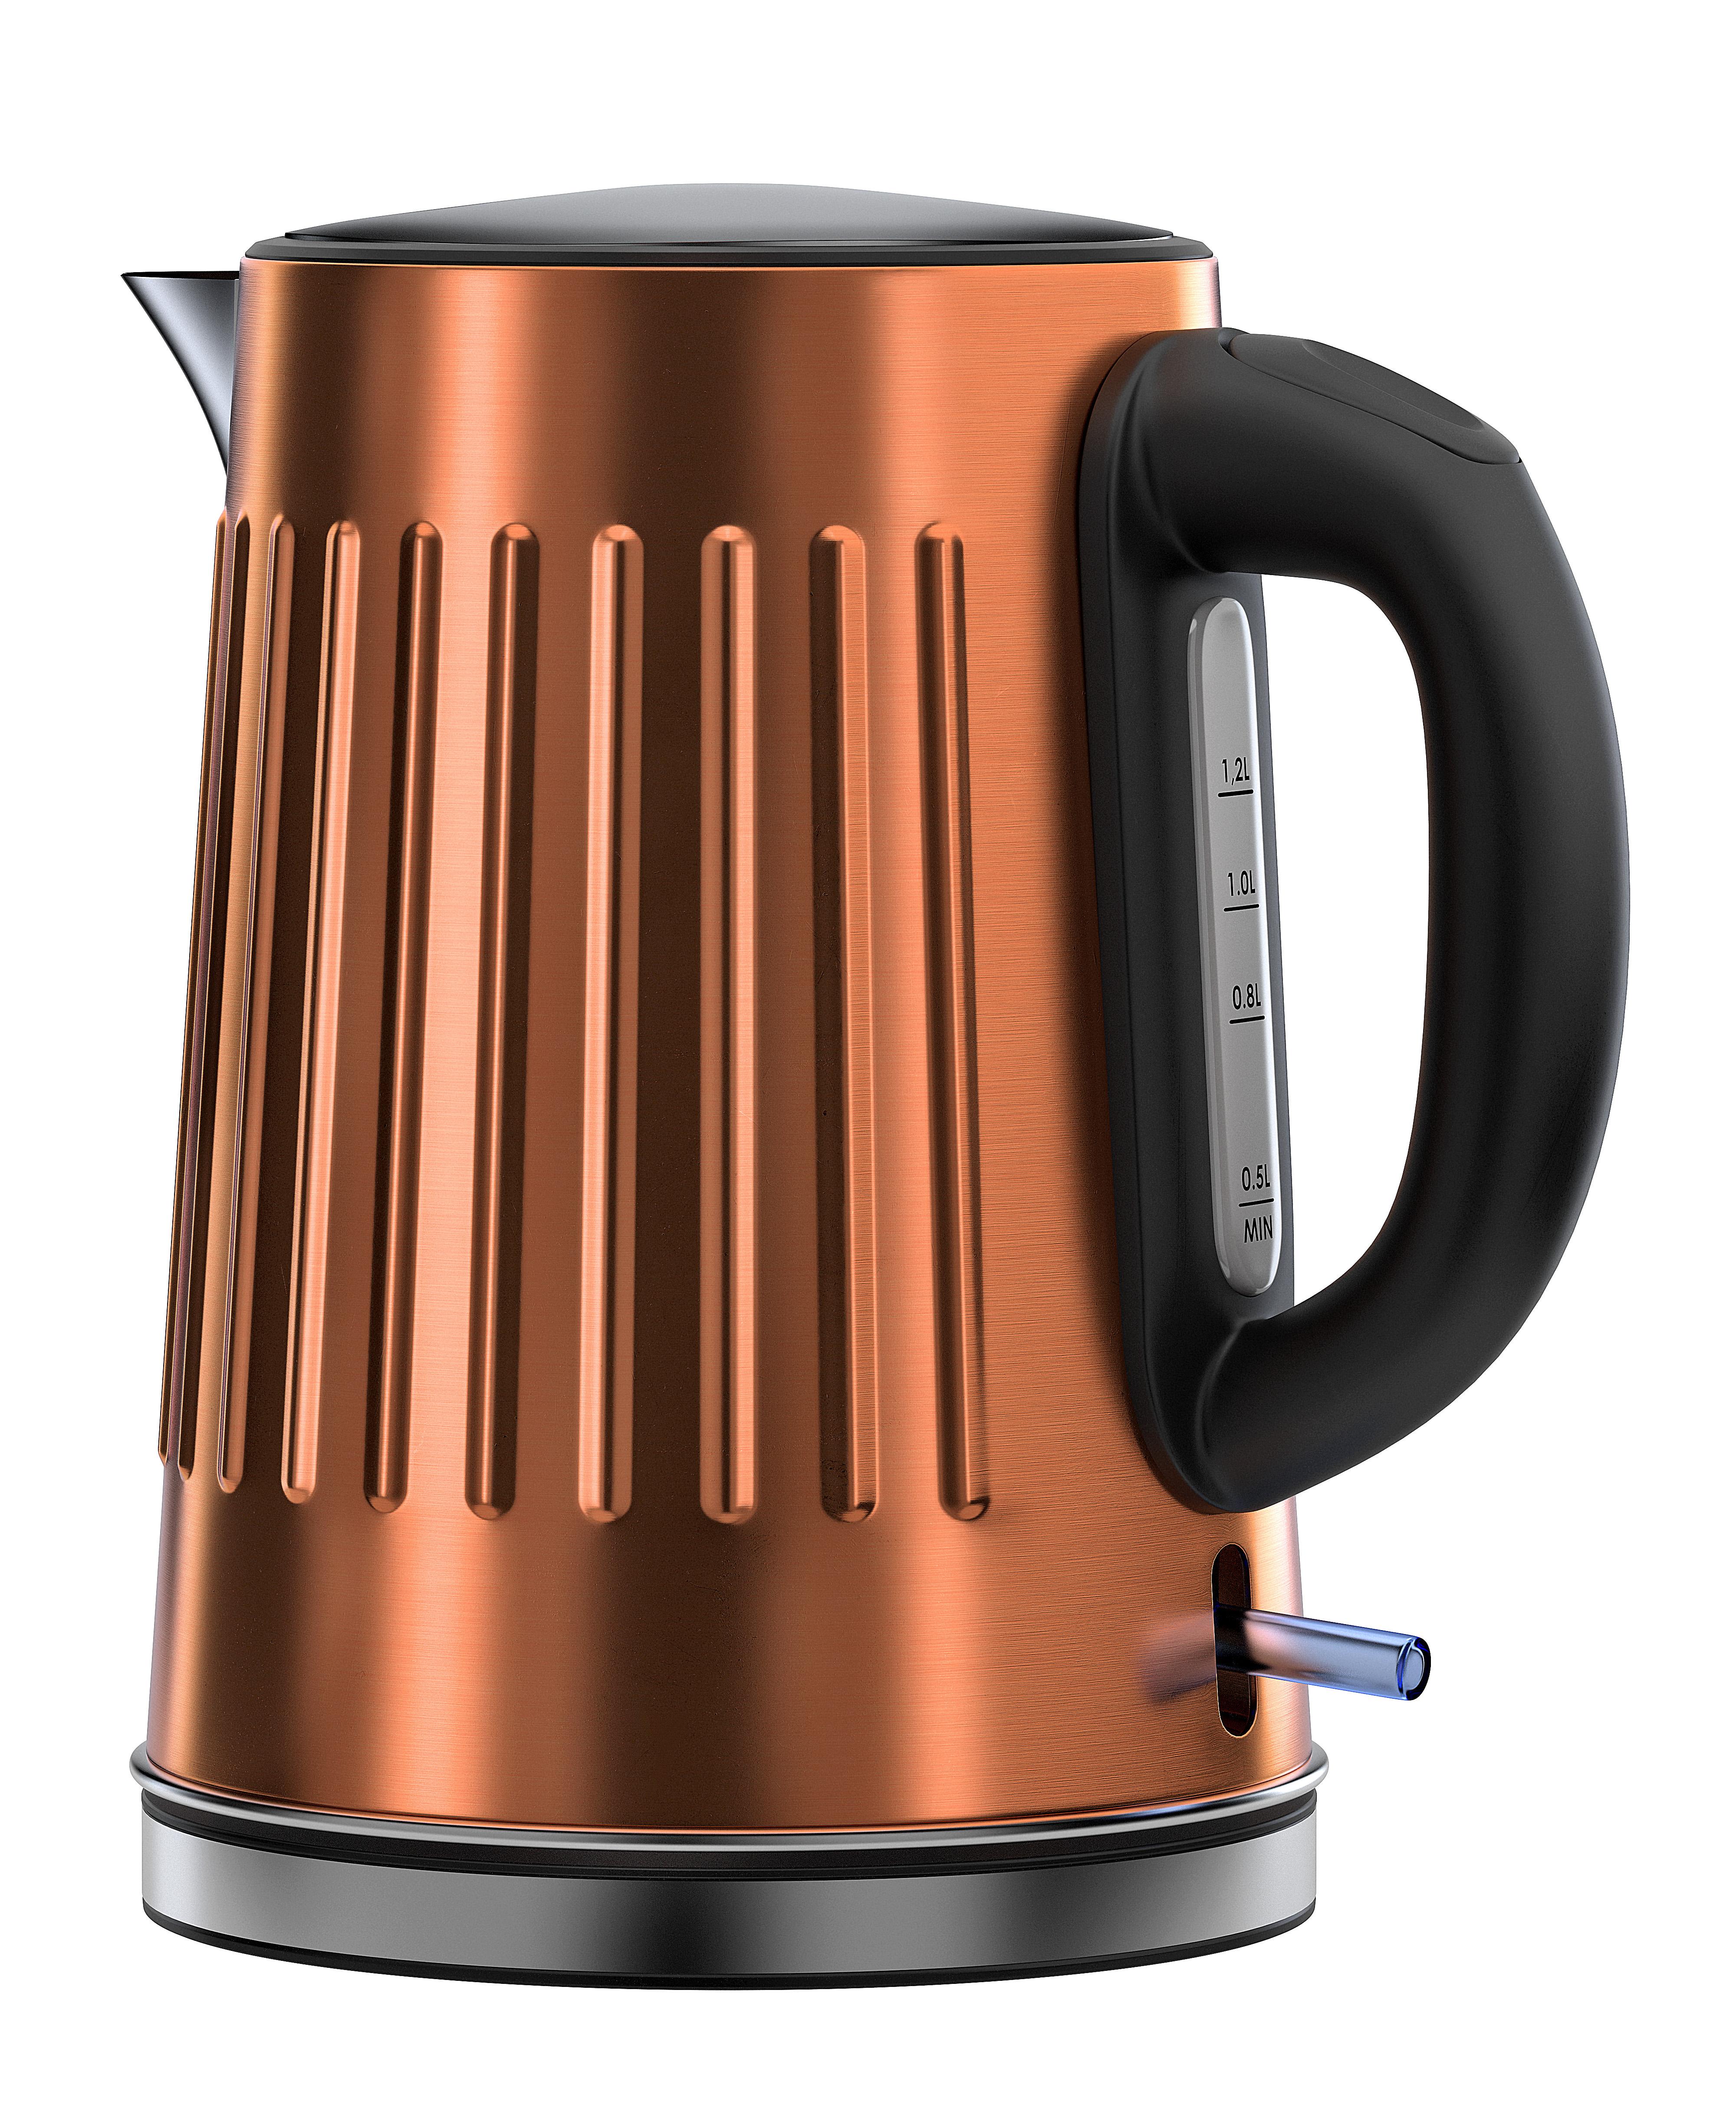 Clas Ohlson Coline kettle 44 1296 4 Clas Ohlson